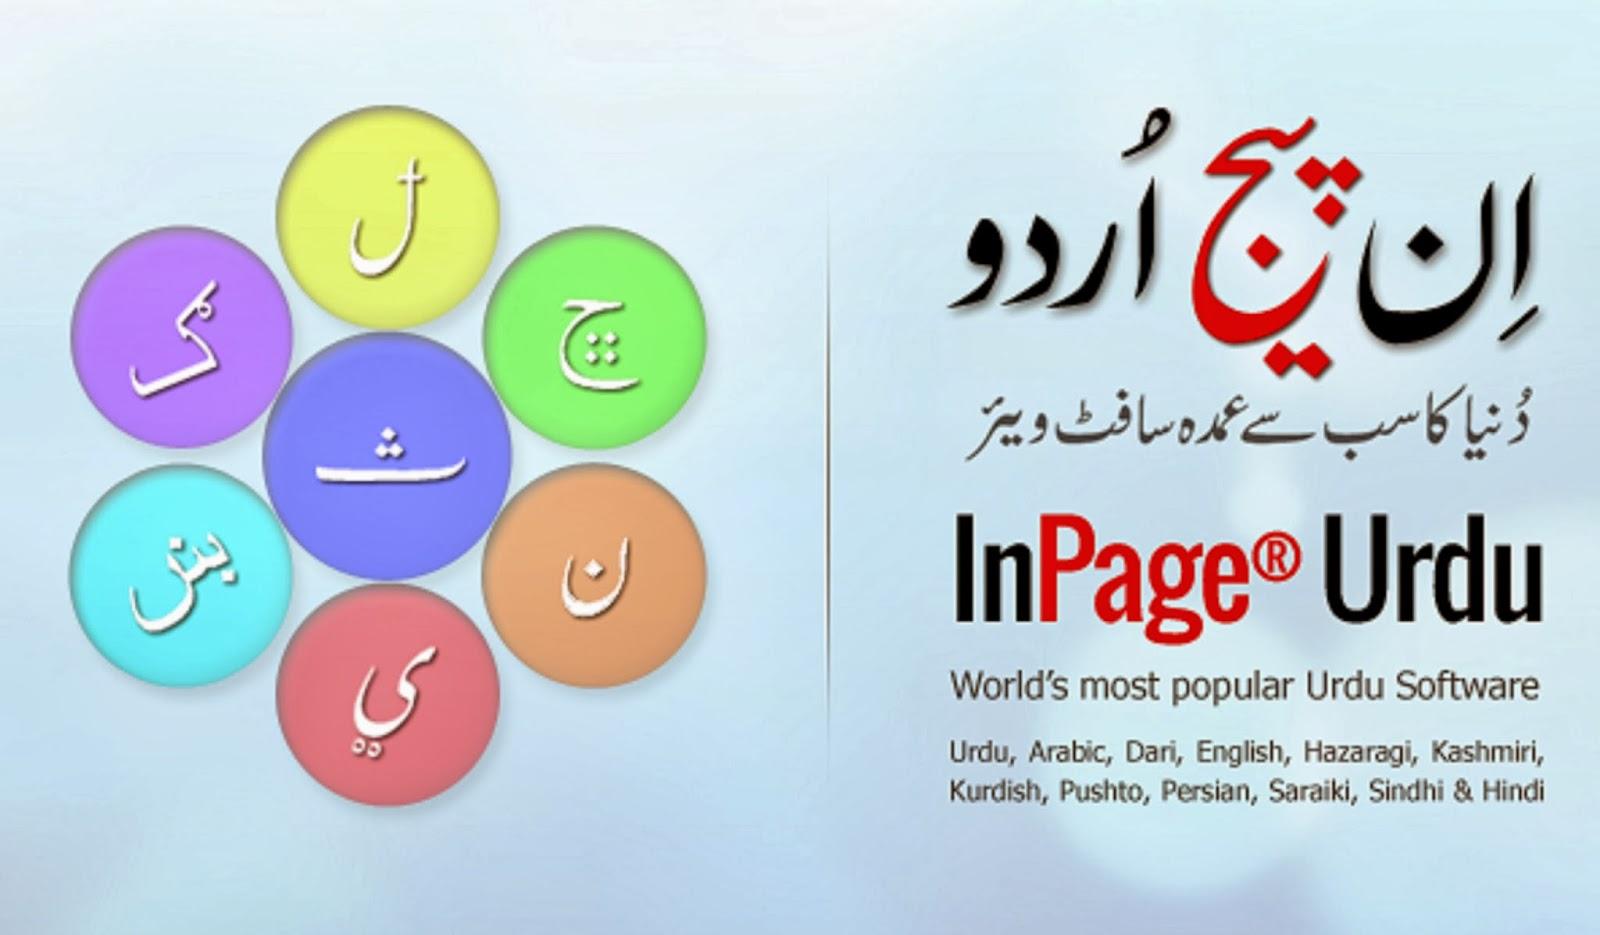 Quran Publishing System 3 20 | اردو سافٹ وئیرز